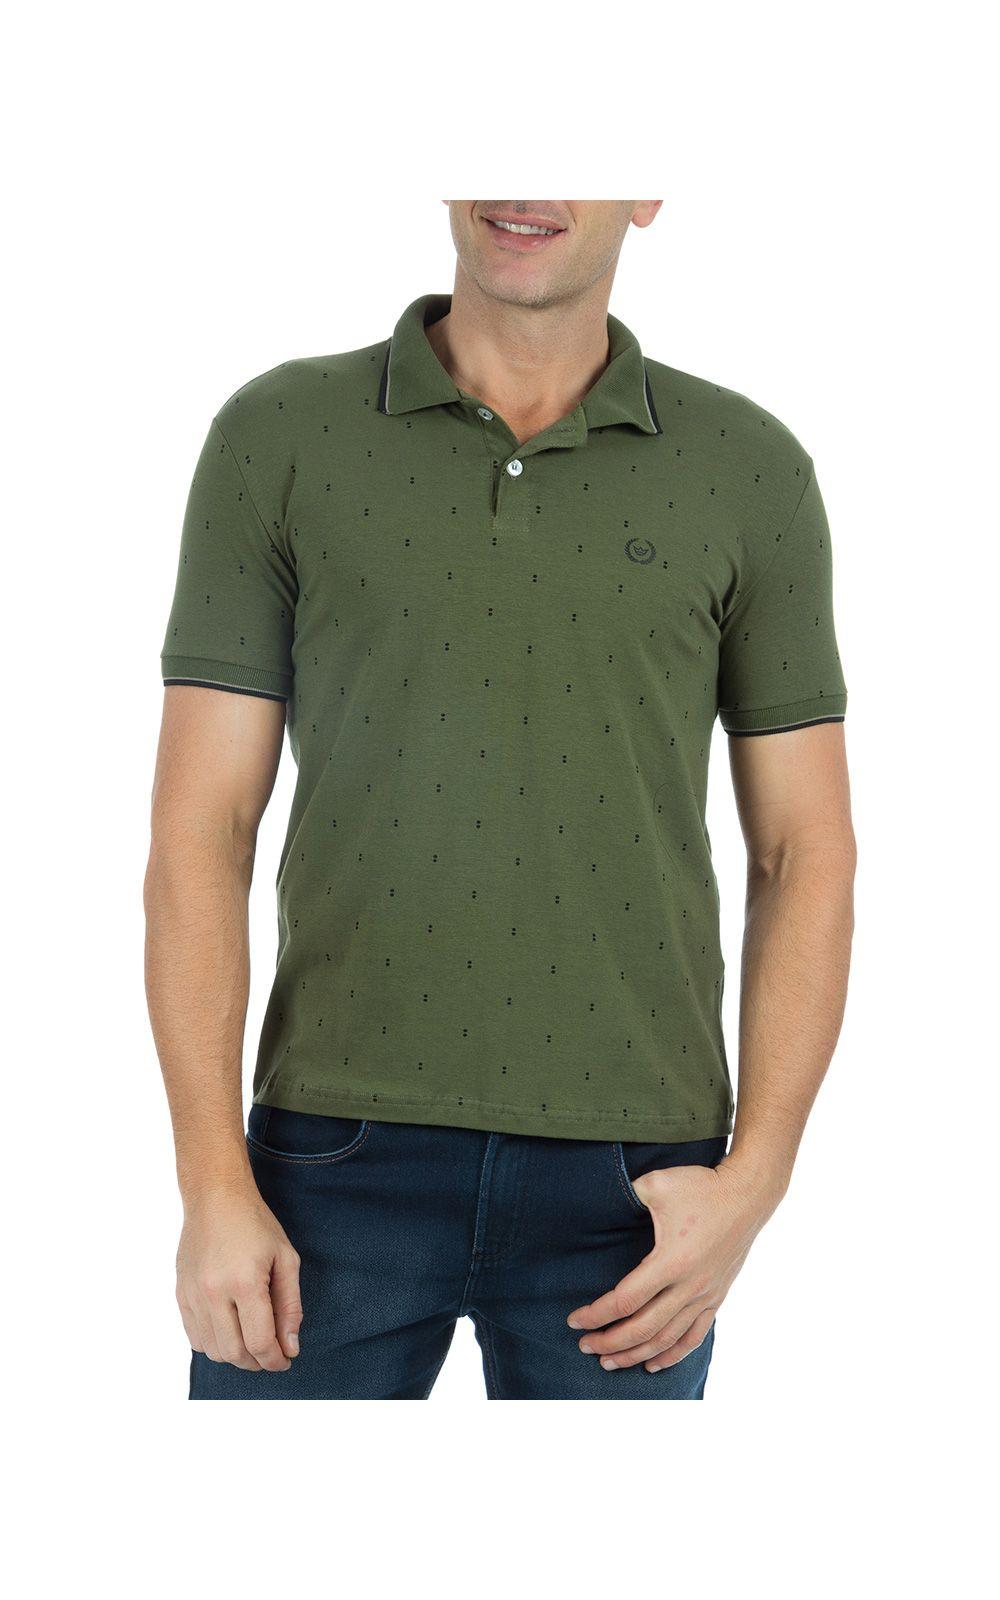 Foto 1 - Camisa Polo Masculina Verde Estampada